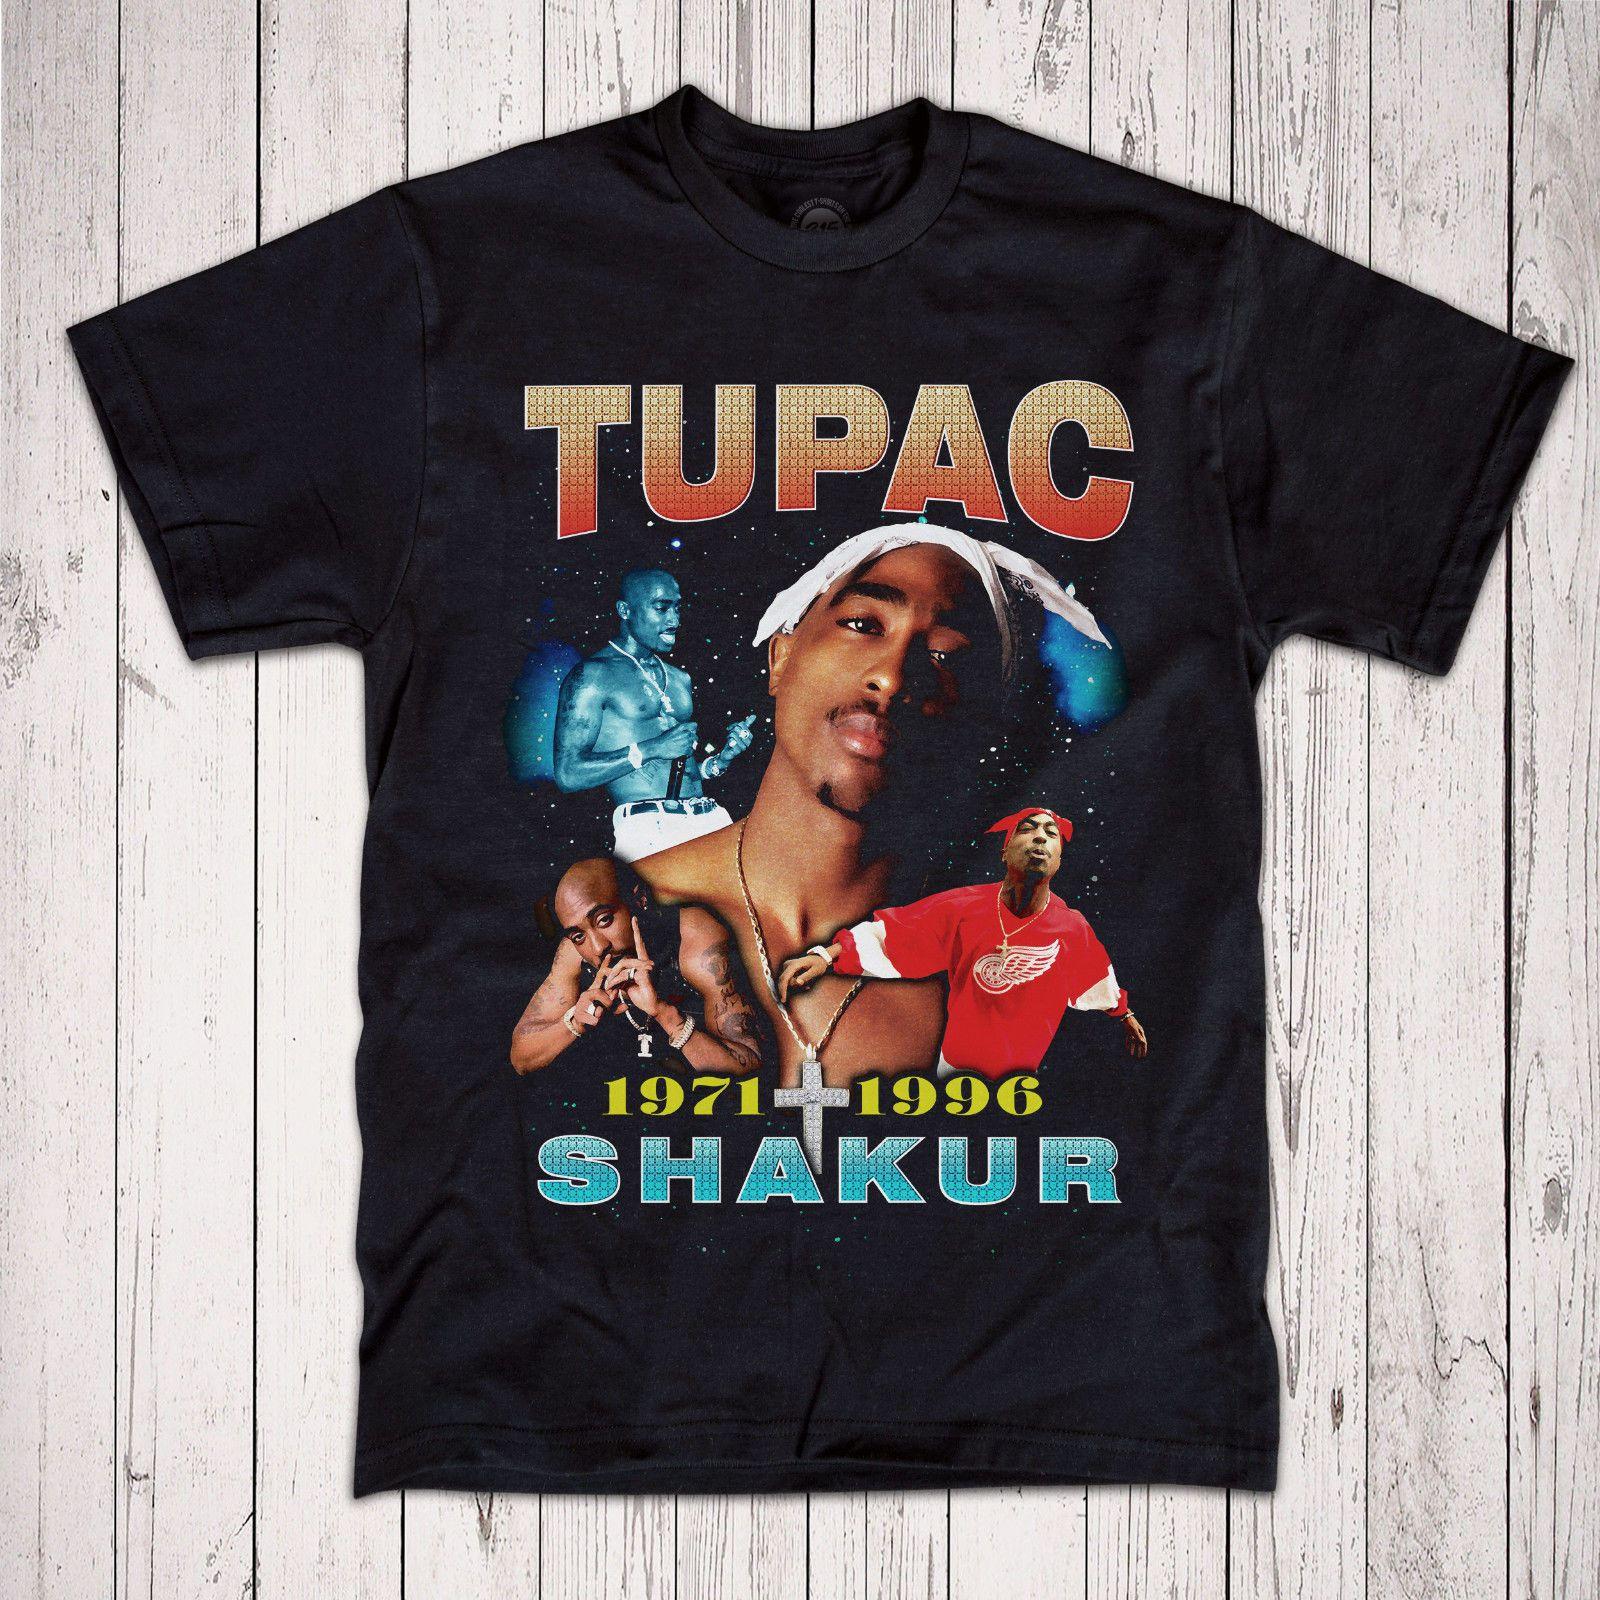 2pac Legend T Shirt By Studio315 Hip Hops Finest Tupac Makaveli Tee